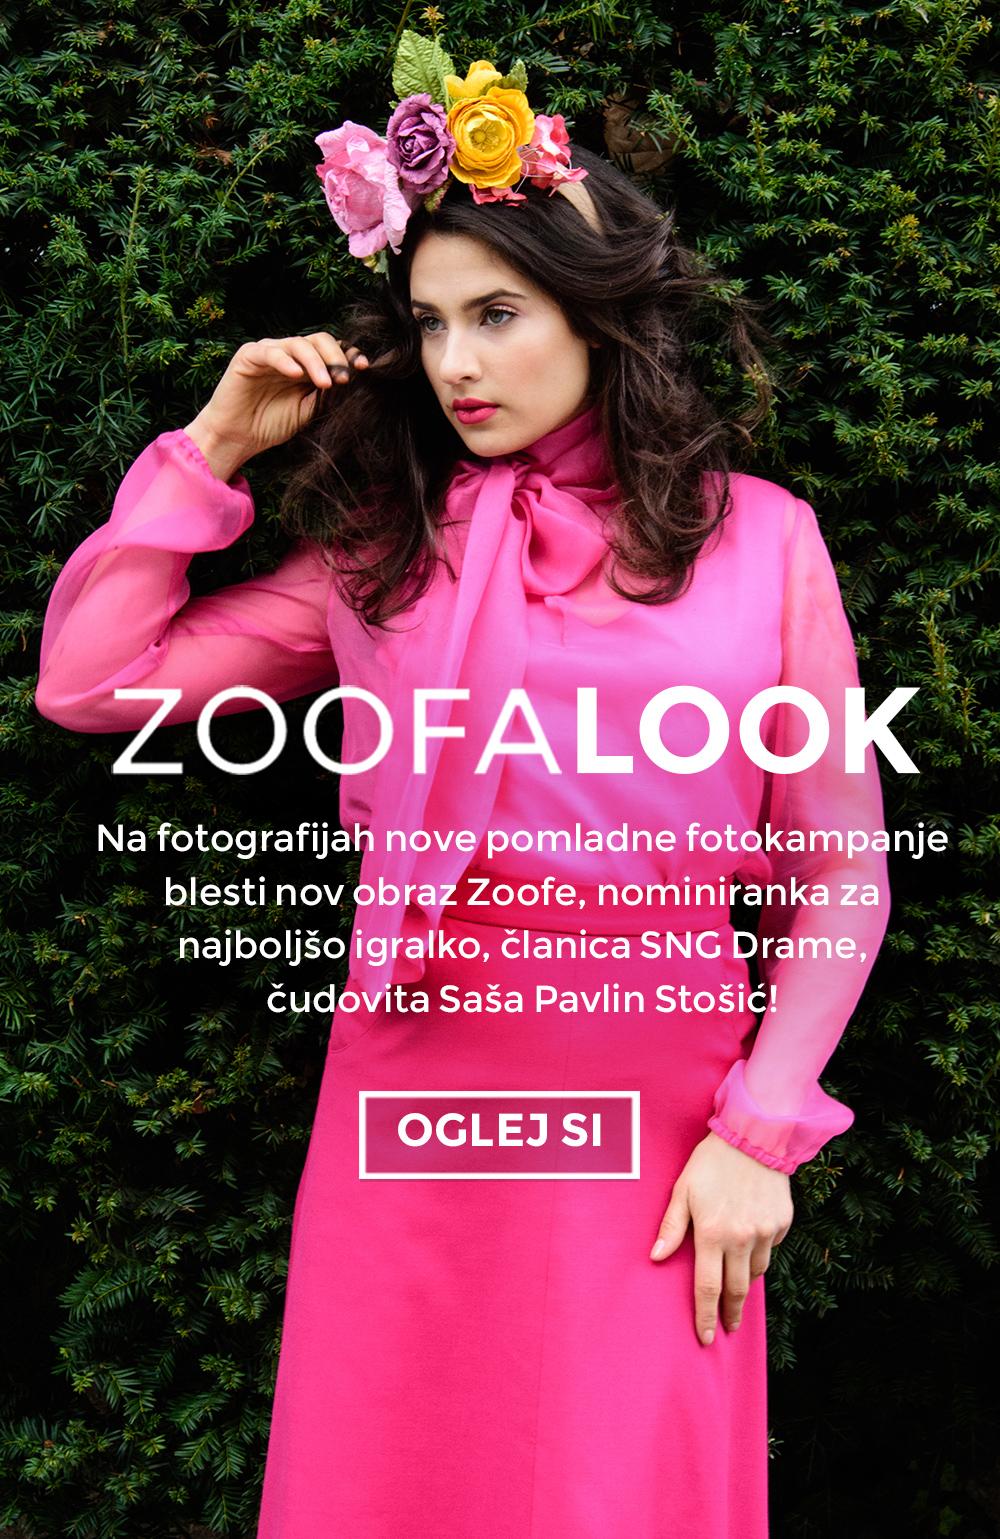 zoofalook-pomlad-3.jpg